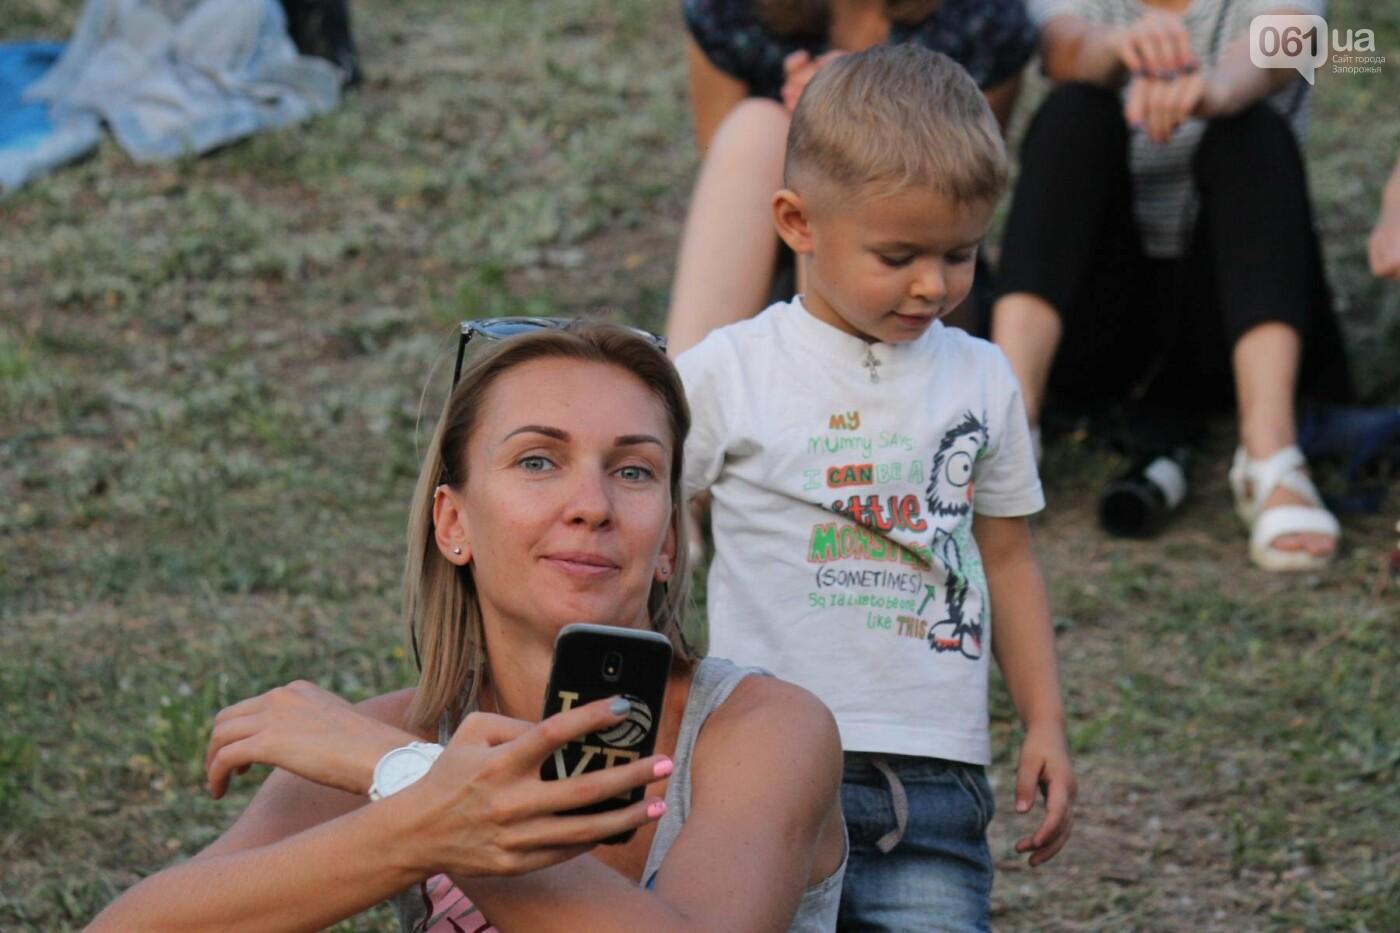 Найди себя: 50 портретов посетителей фестиваля Khortytsia Freedom, – ФОТОРЕПОРТАЖ, фото-29